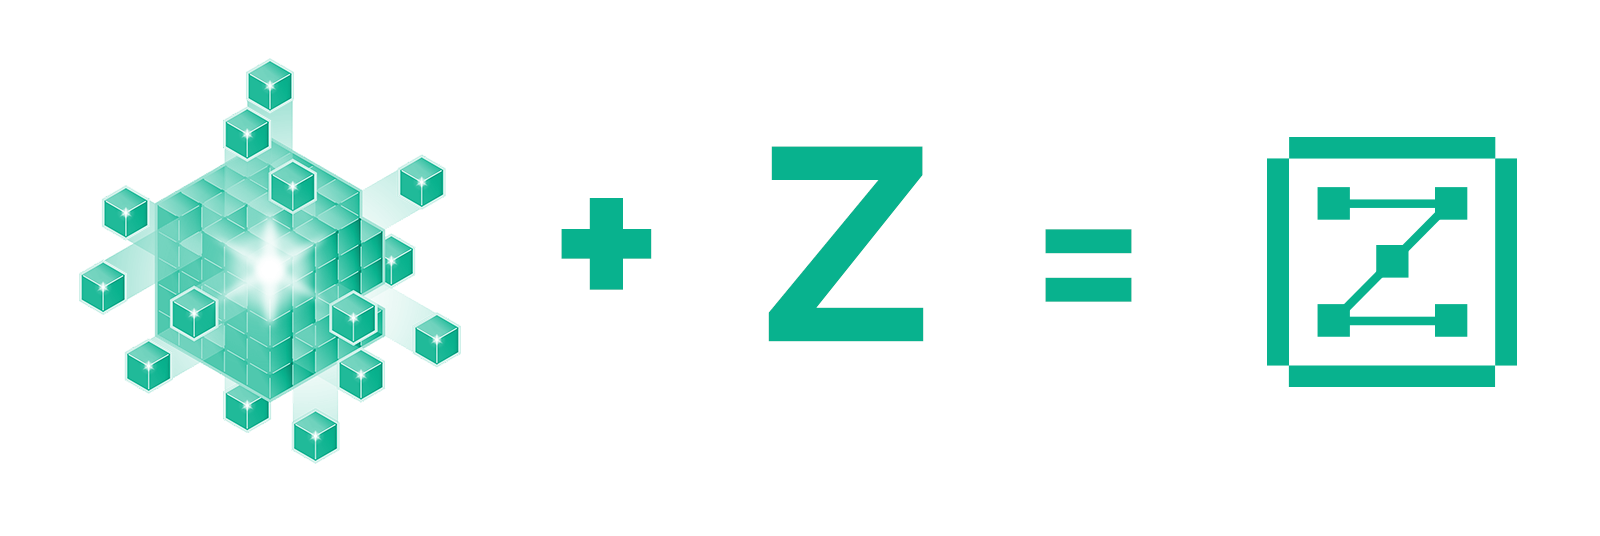 zdba logo build